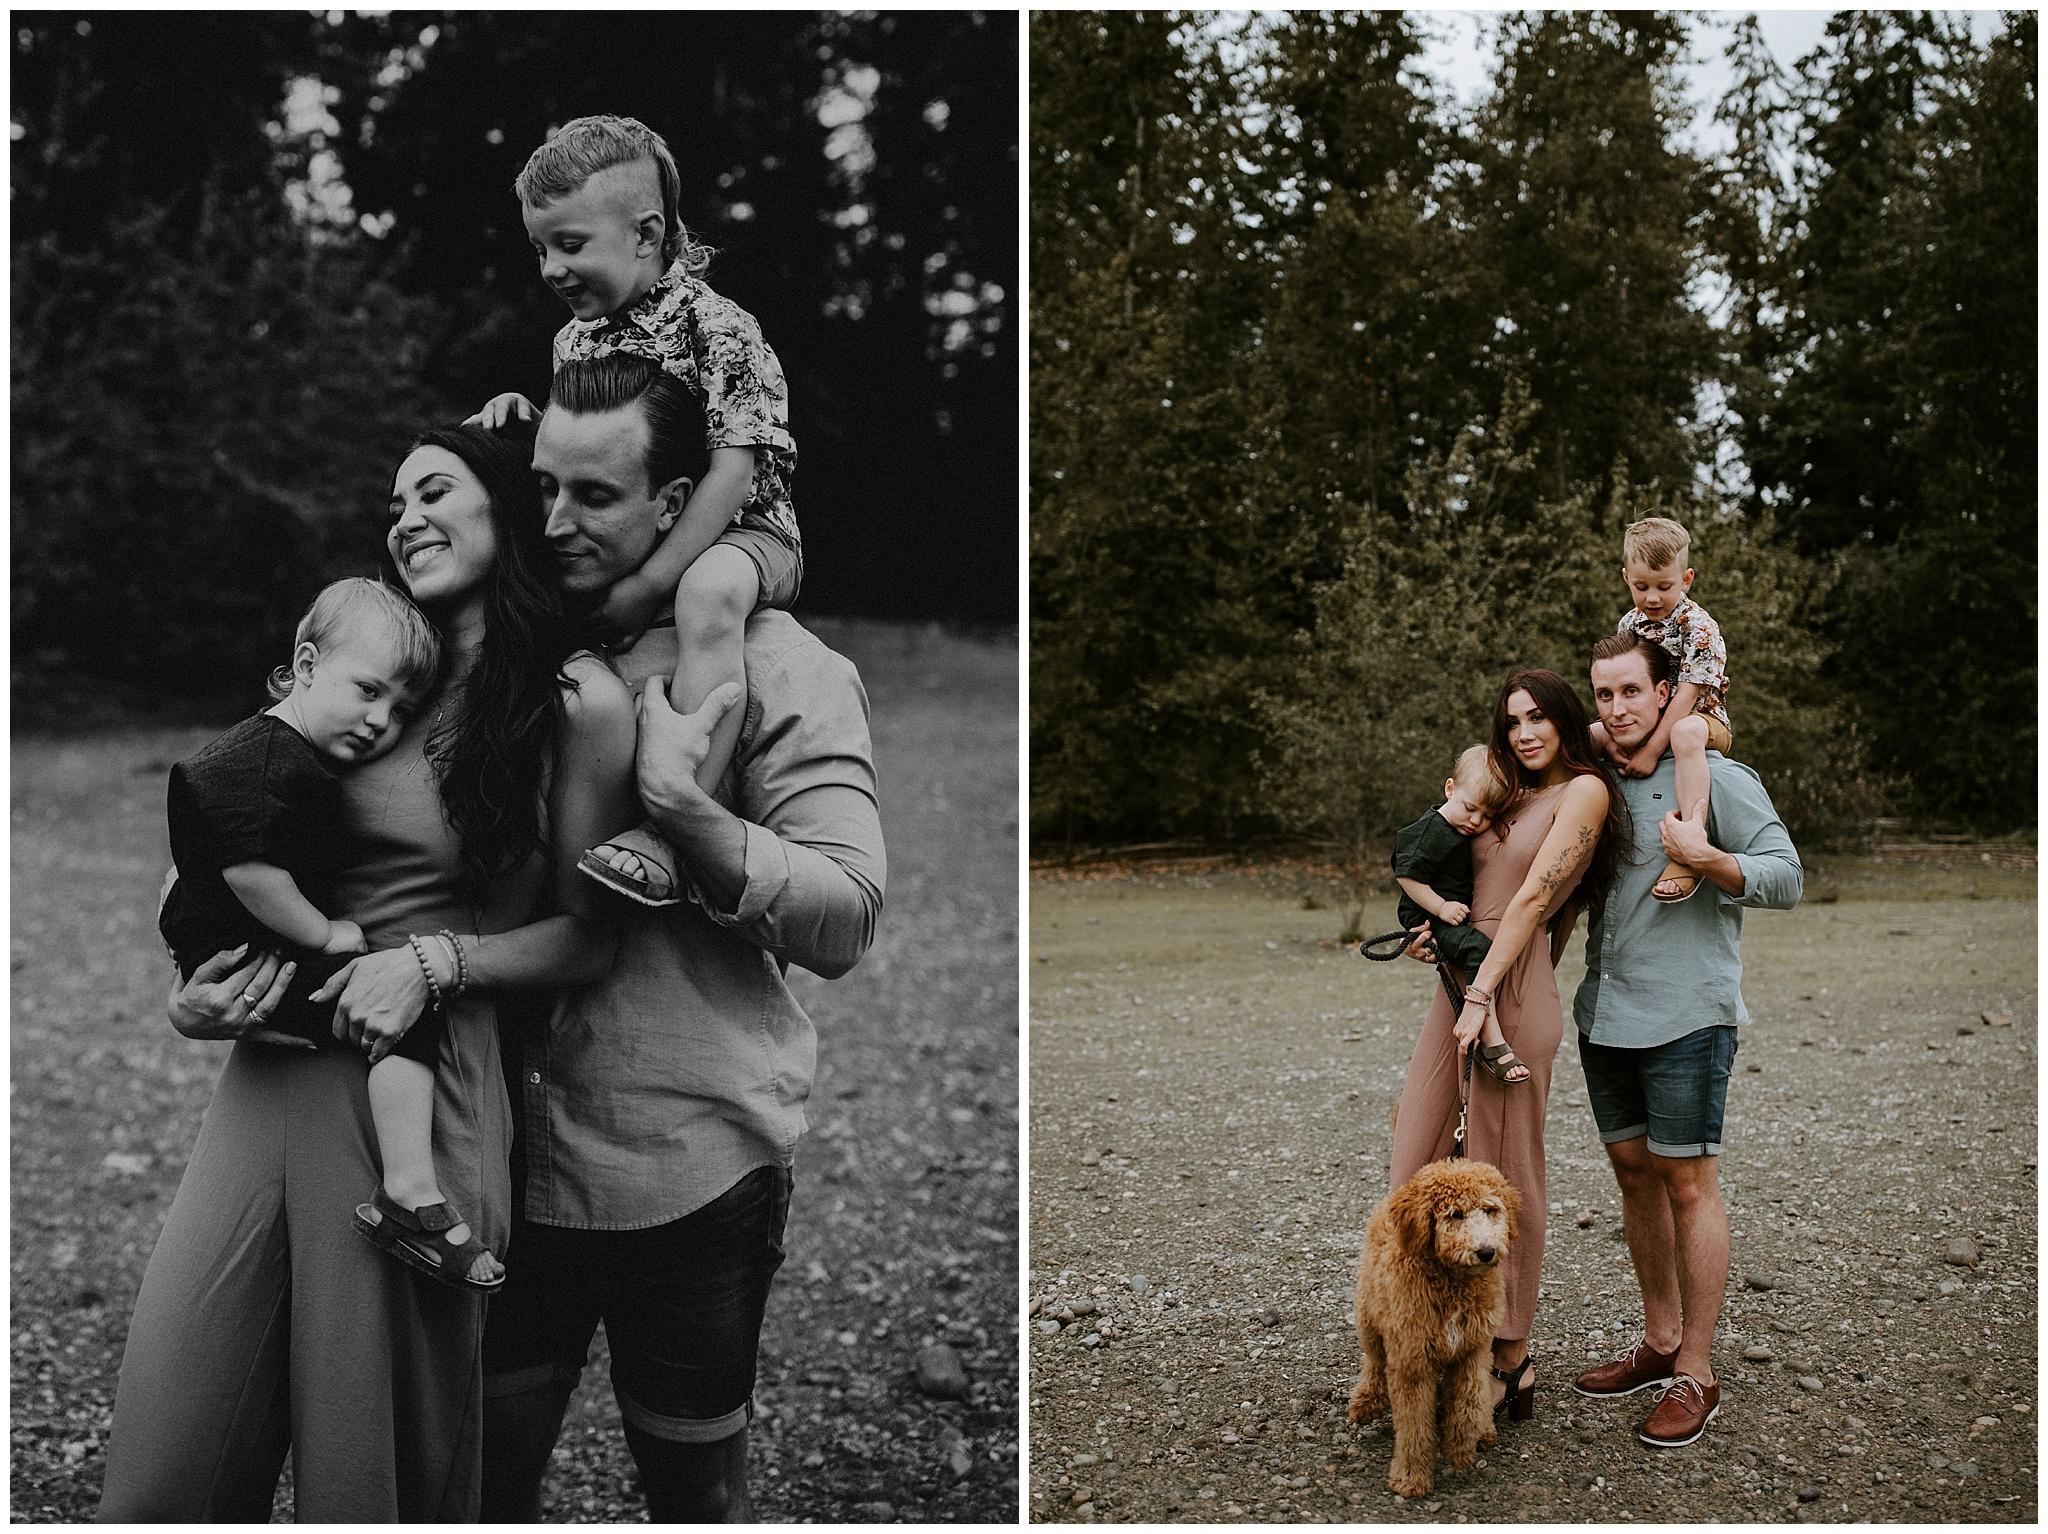 boho_family_session_vancouver_family_photographyer_006.JPG